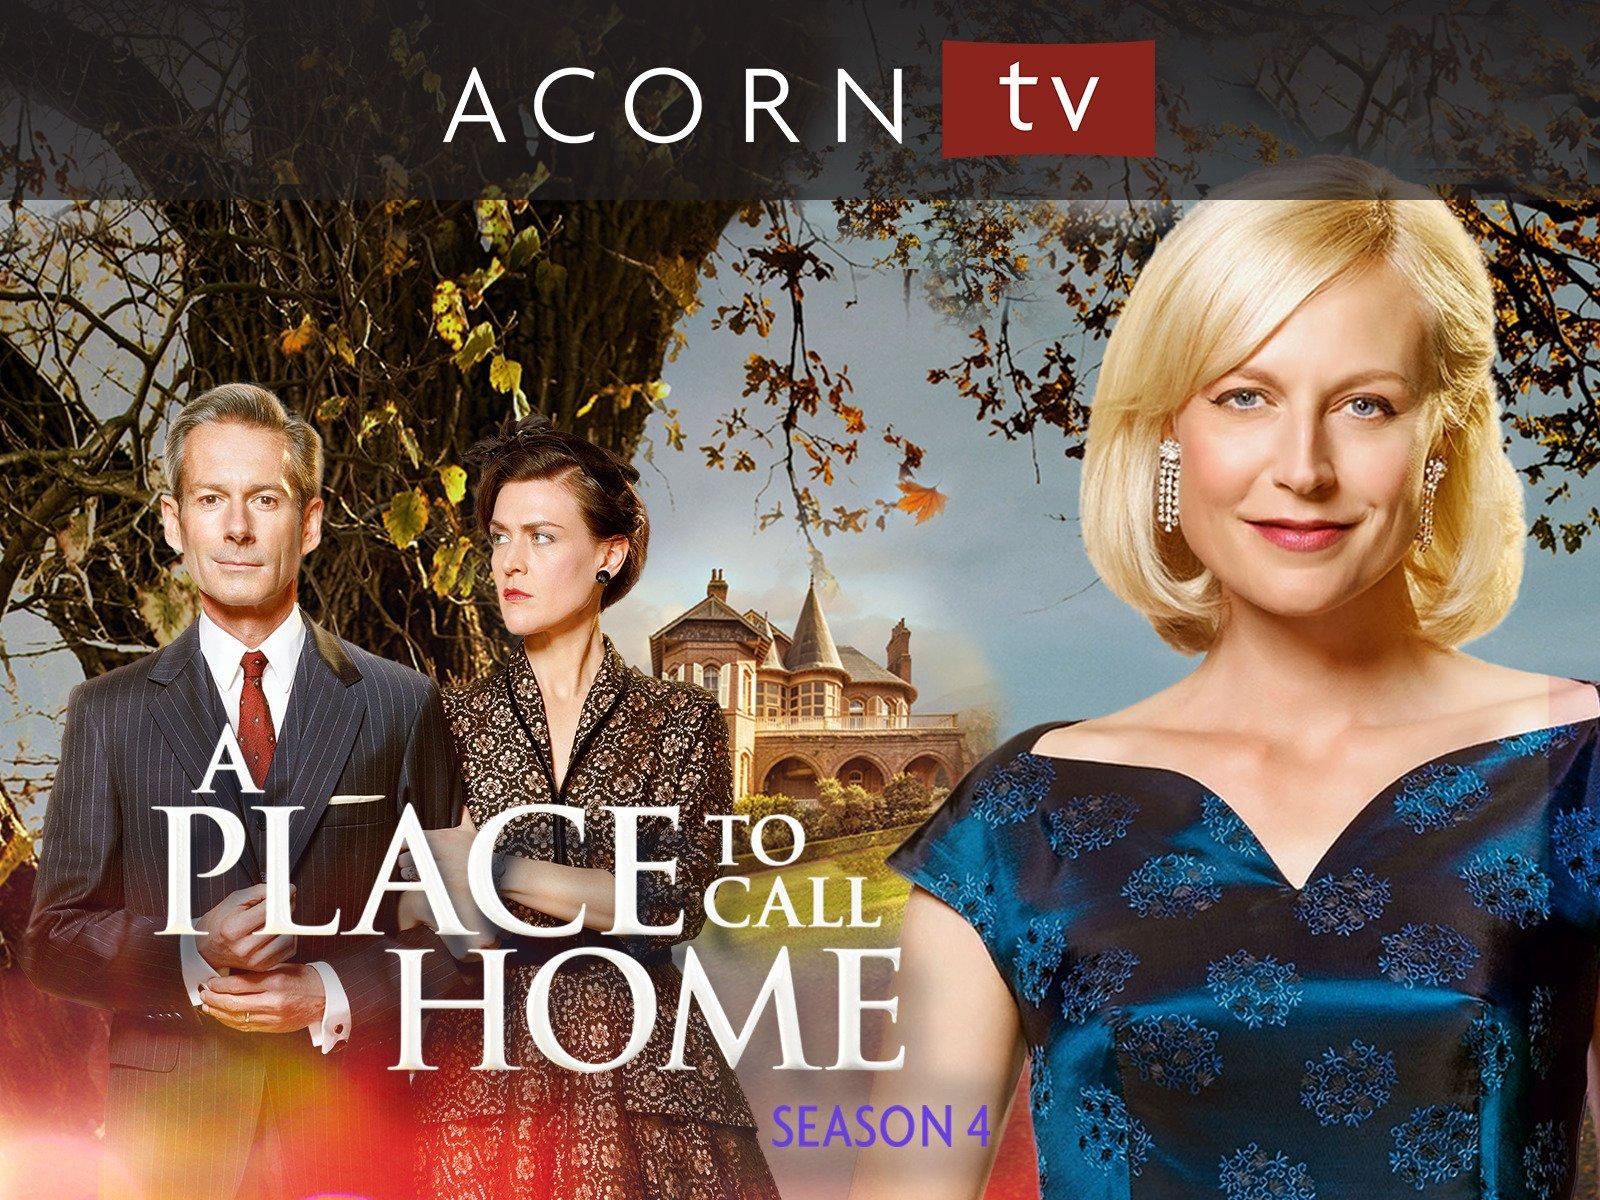 Amazon.com: Watch A Place to Call Home - Season 3 | Prime Video